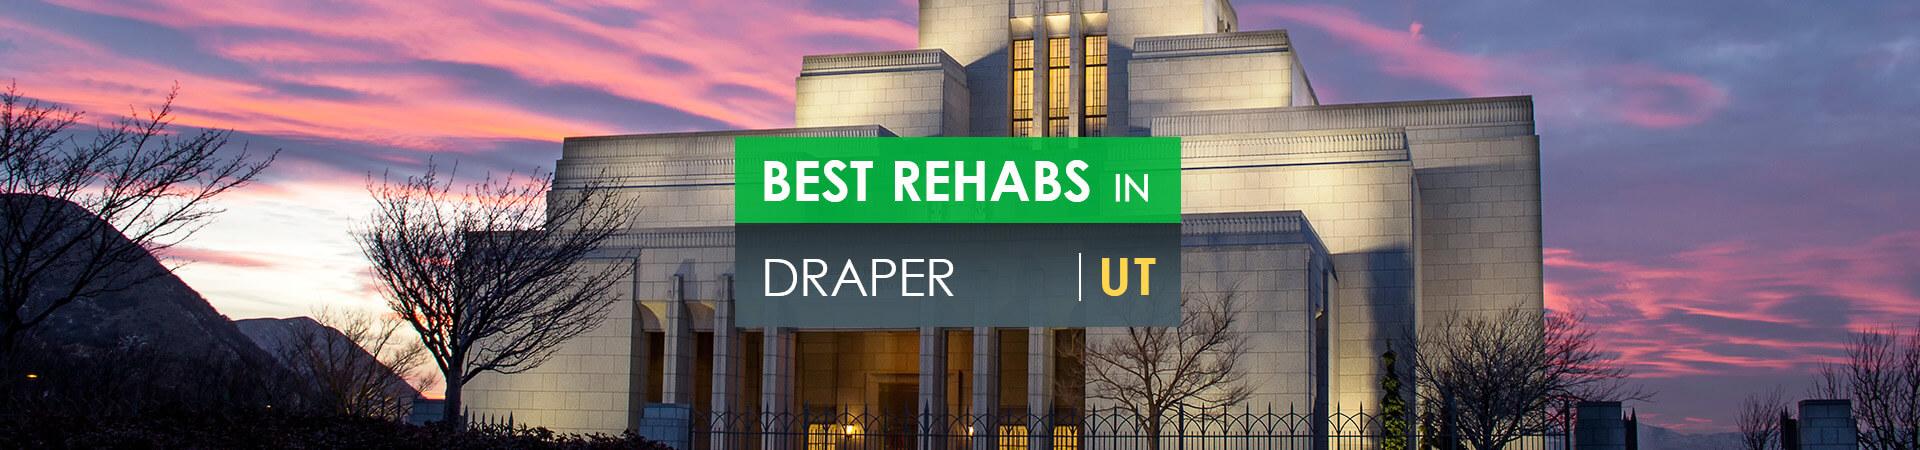 Best rehabs in Draper, UT